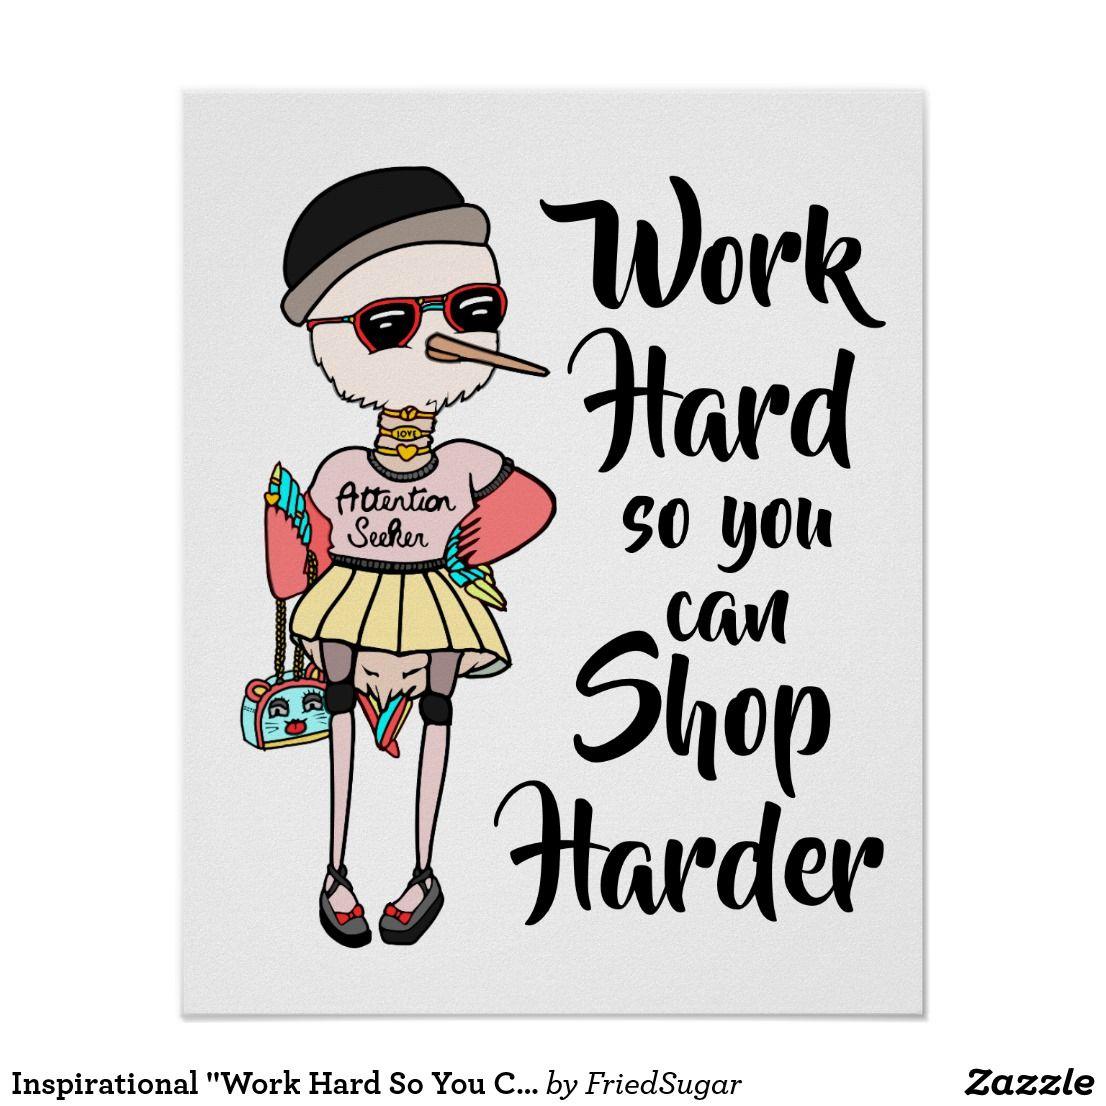 Funny Pink Kawaii Bird Work Hard Shop Harder Poster Zazzle Com Shopaholic Quotes Shopaholic Funny Workaholics Quotes